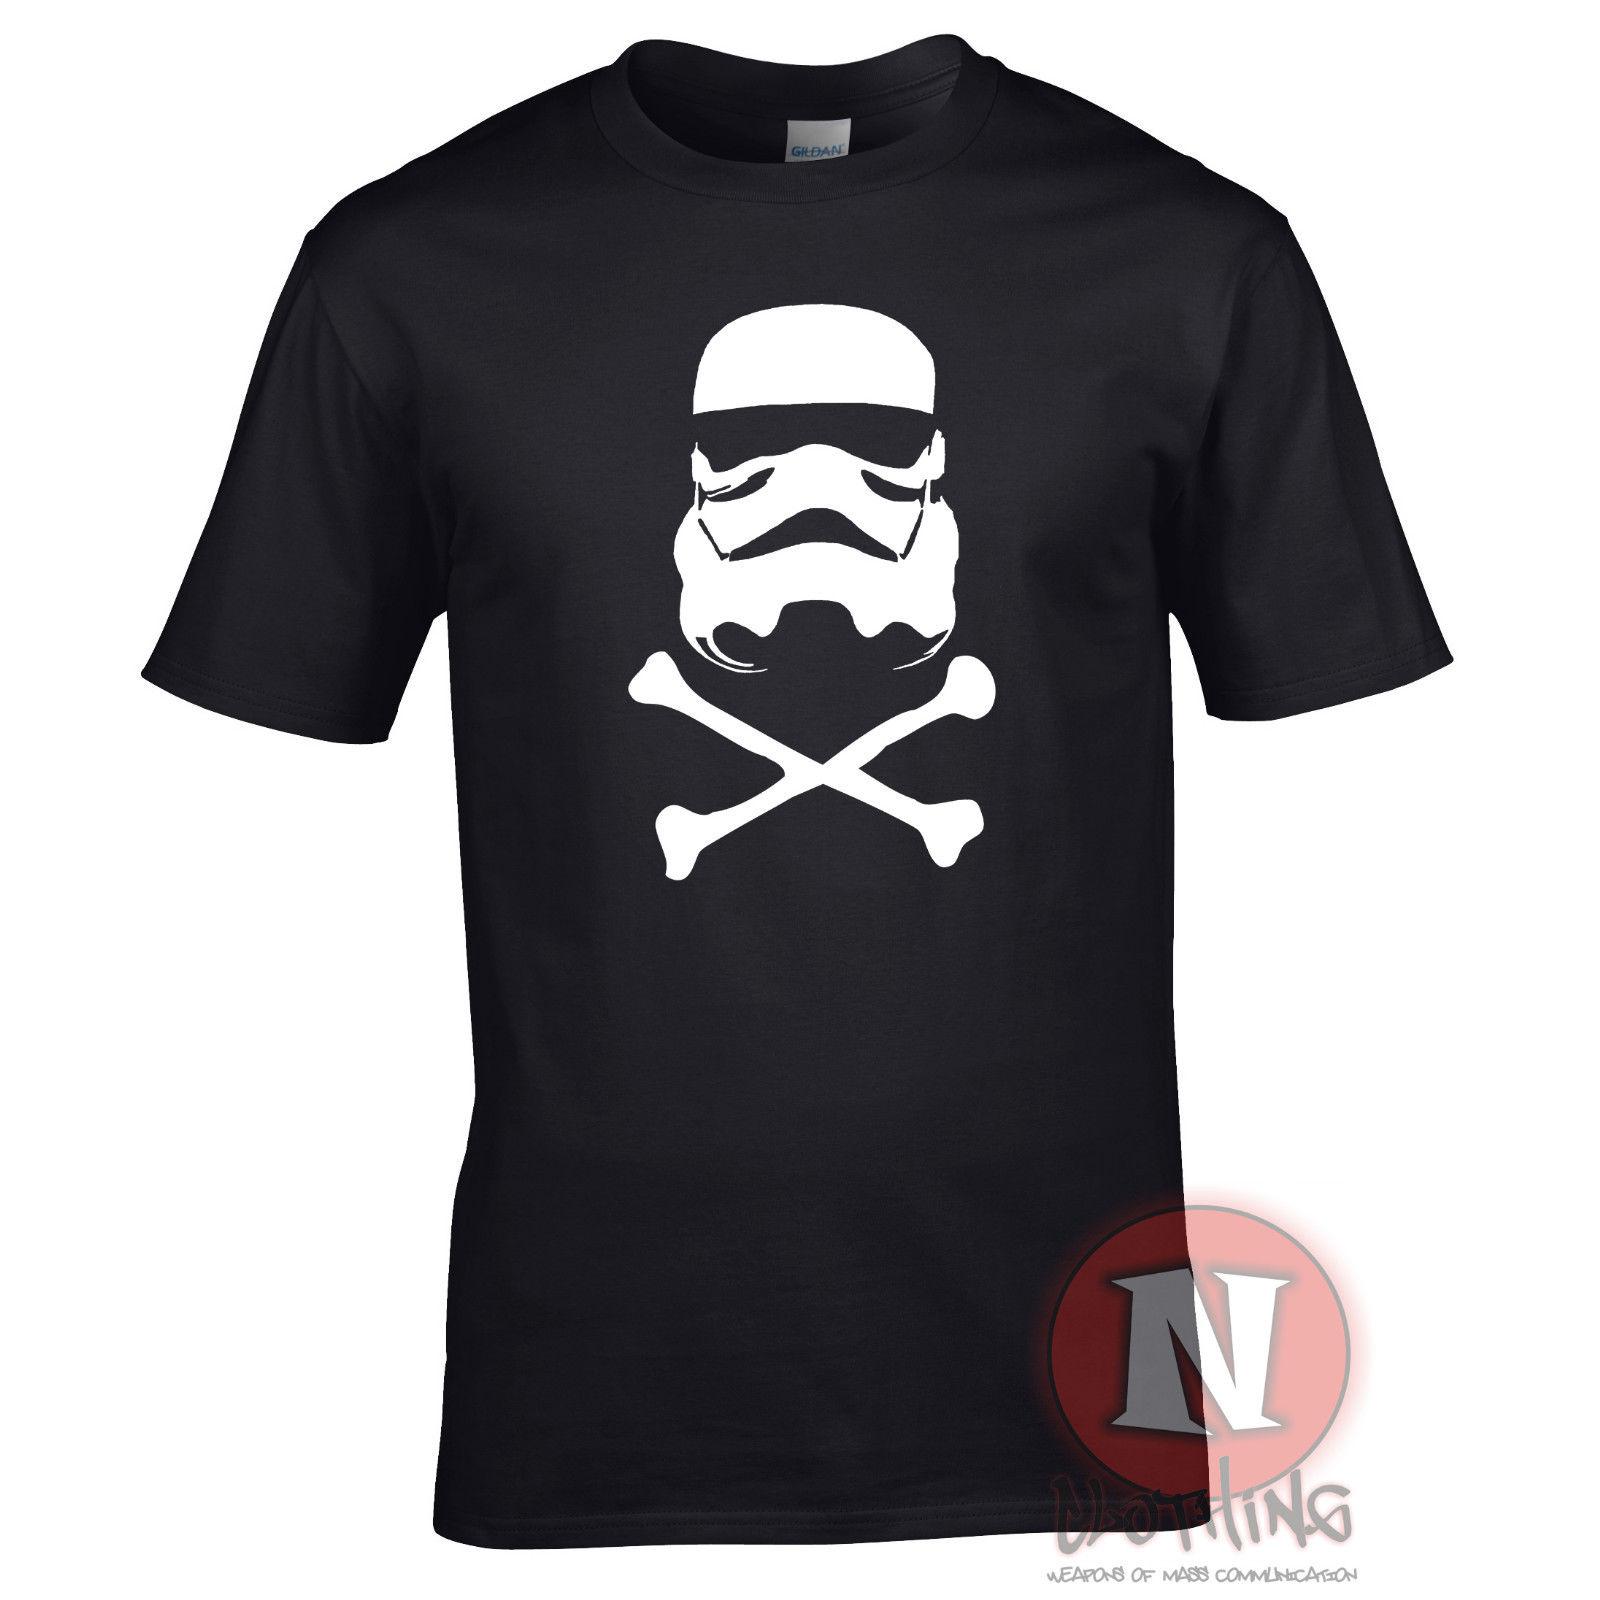 STORMTROOPER skull crossbones Star wars space pirate nerd t-shirt Free shipping  Harajuku Tops Fashion Classic